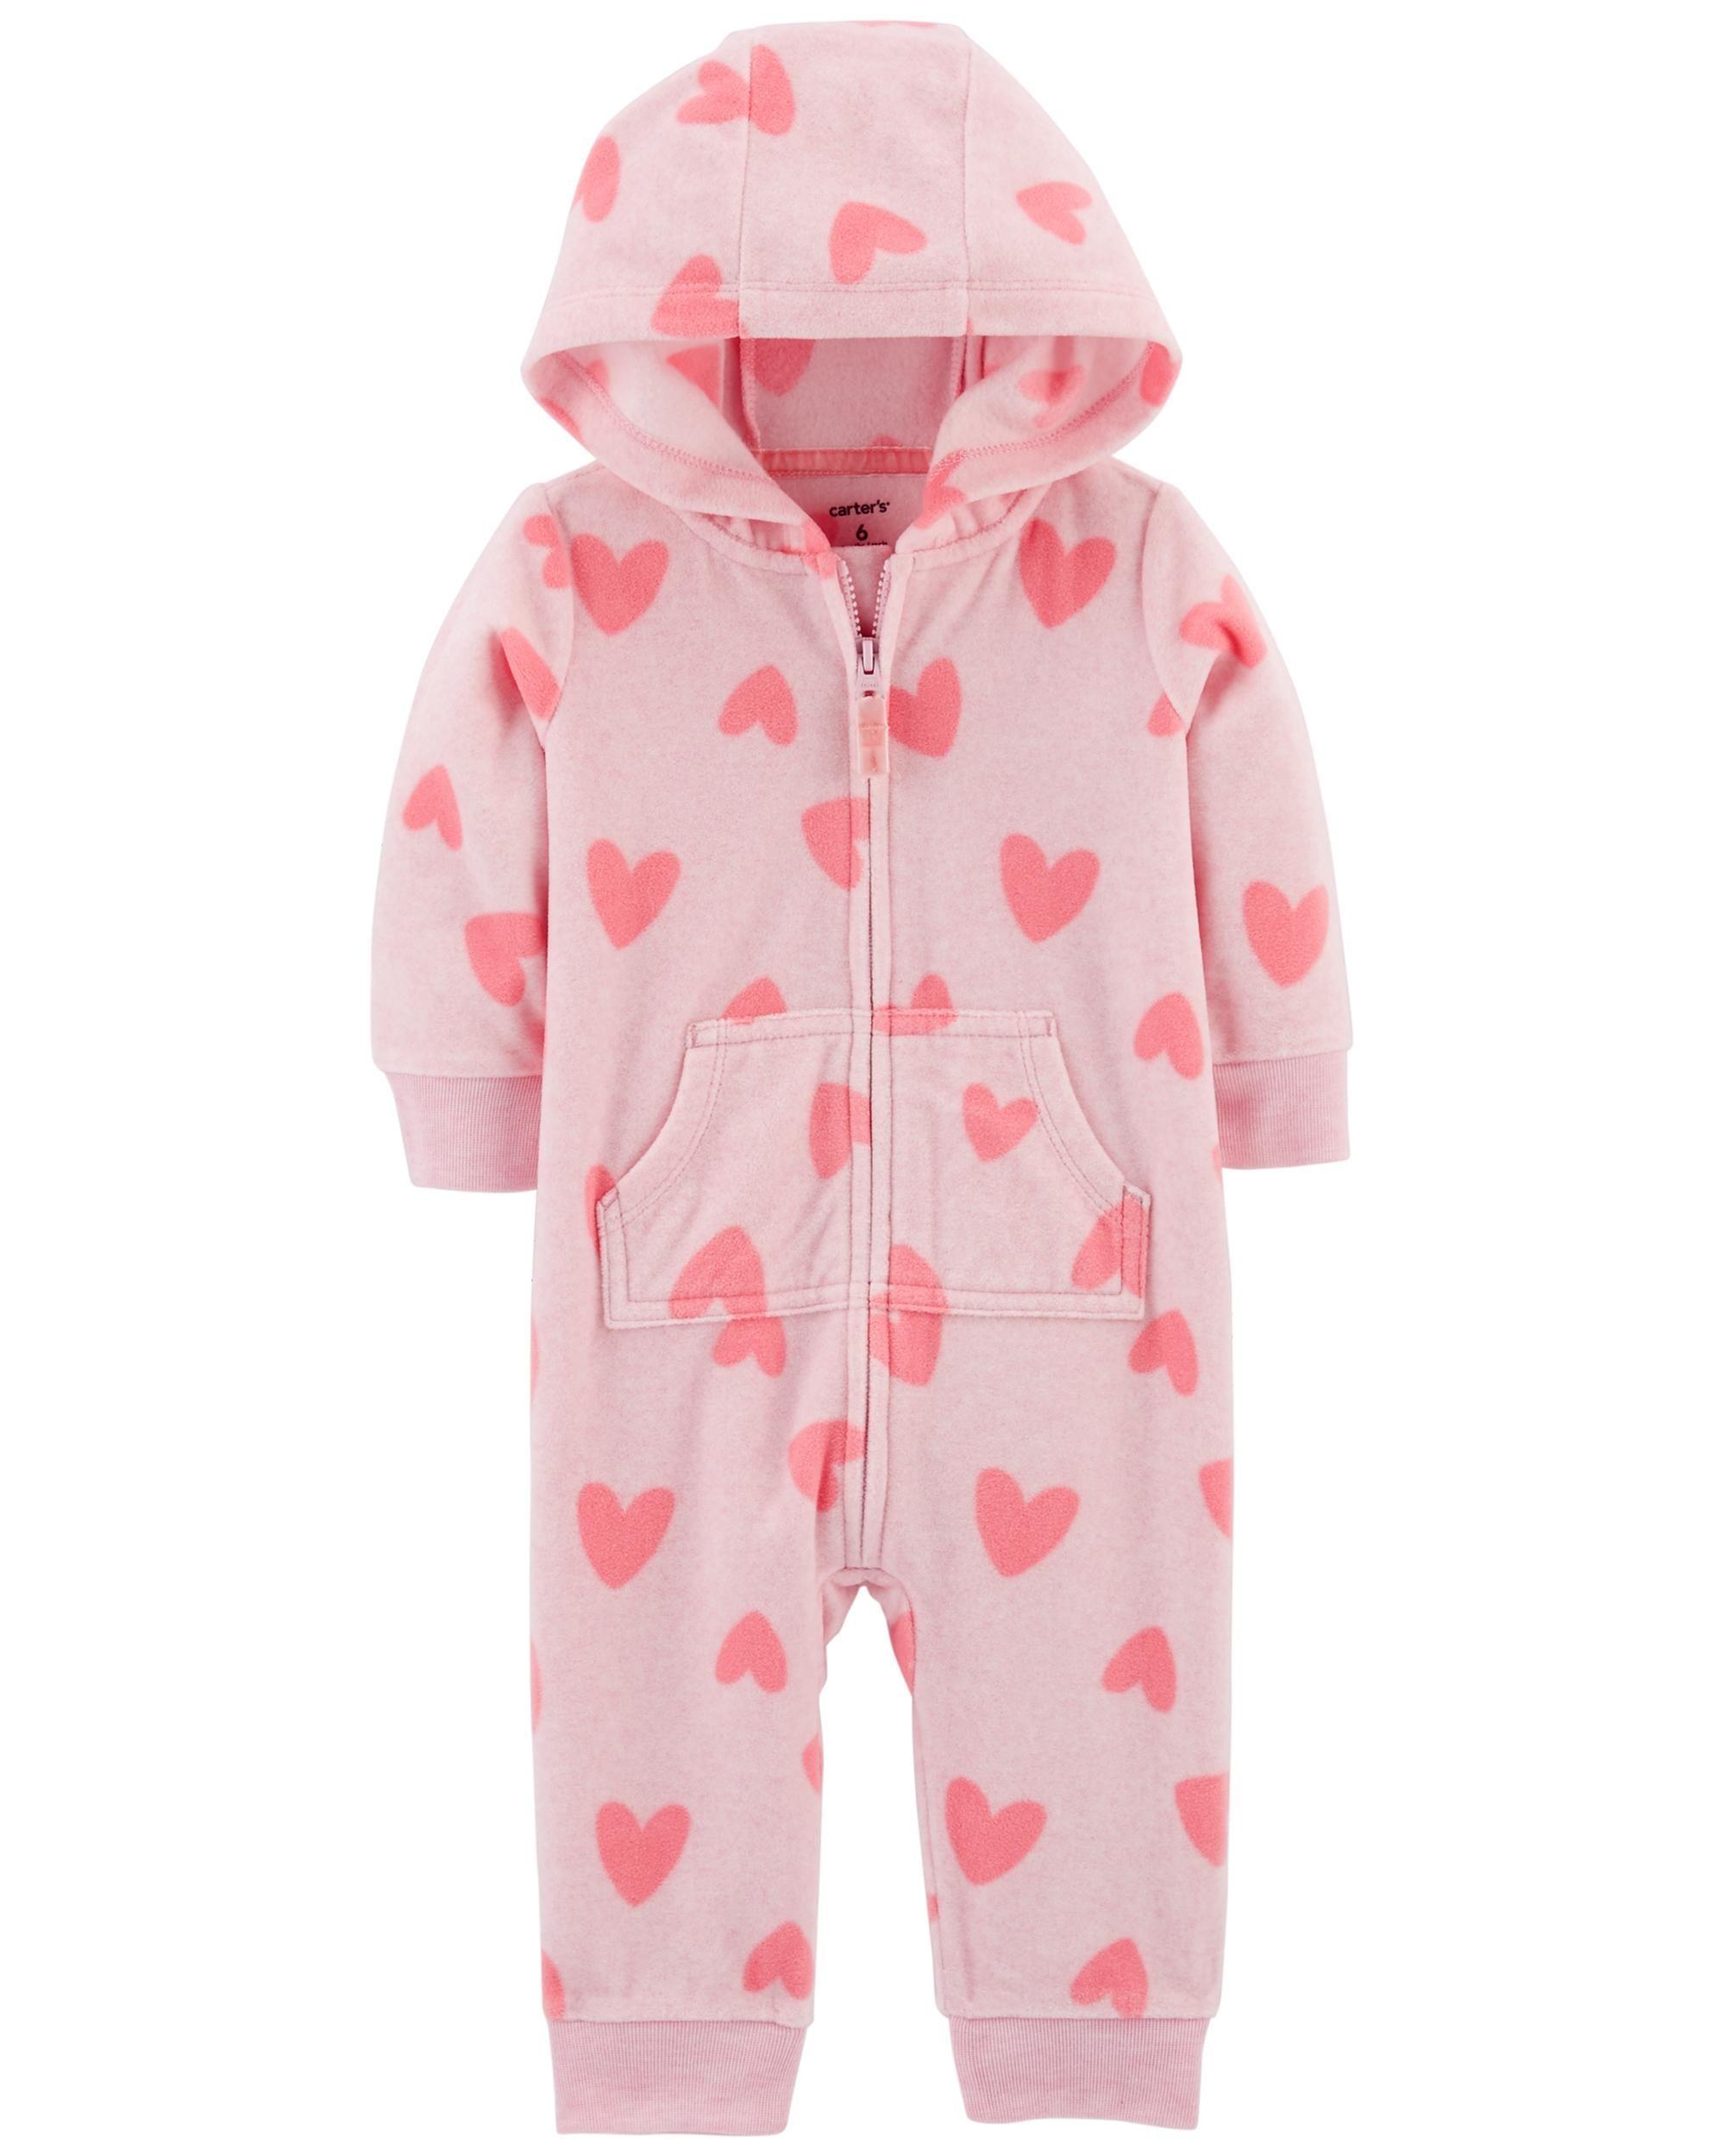 772b8104a Heart Fleece Hooded Jumpsuit